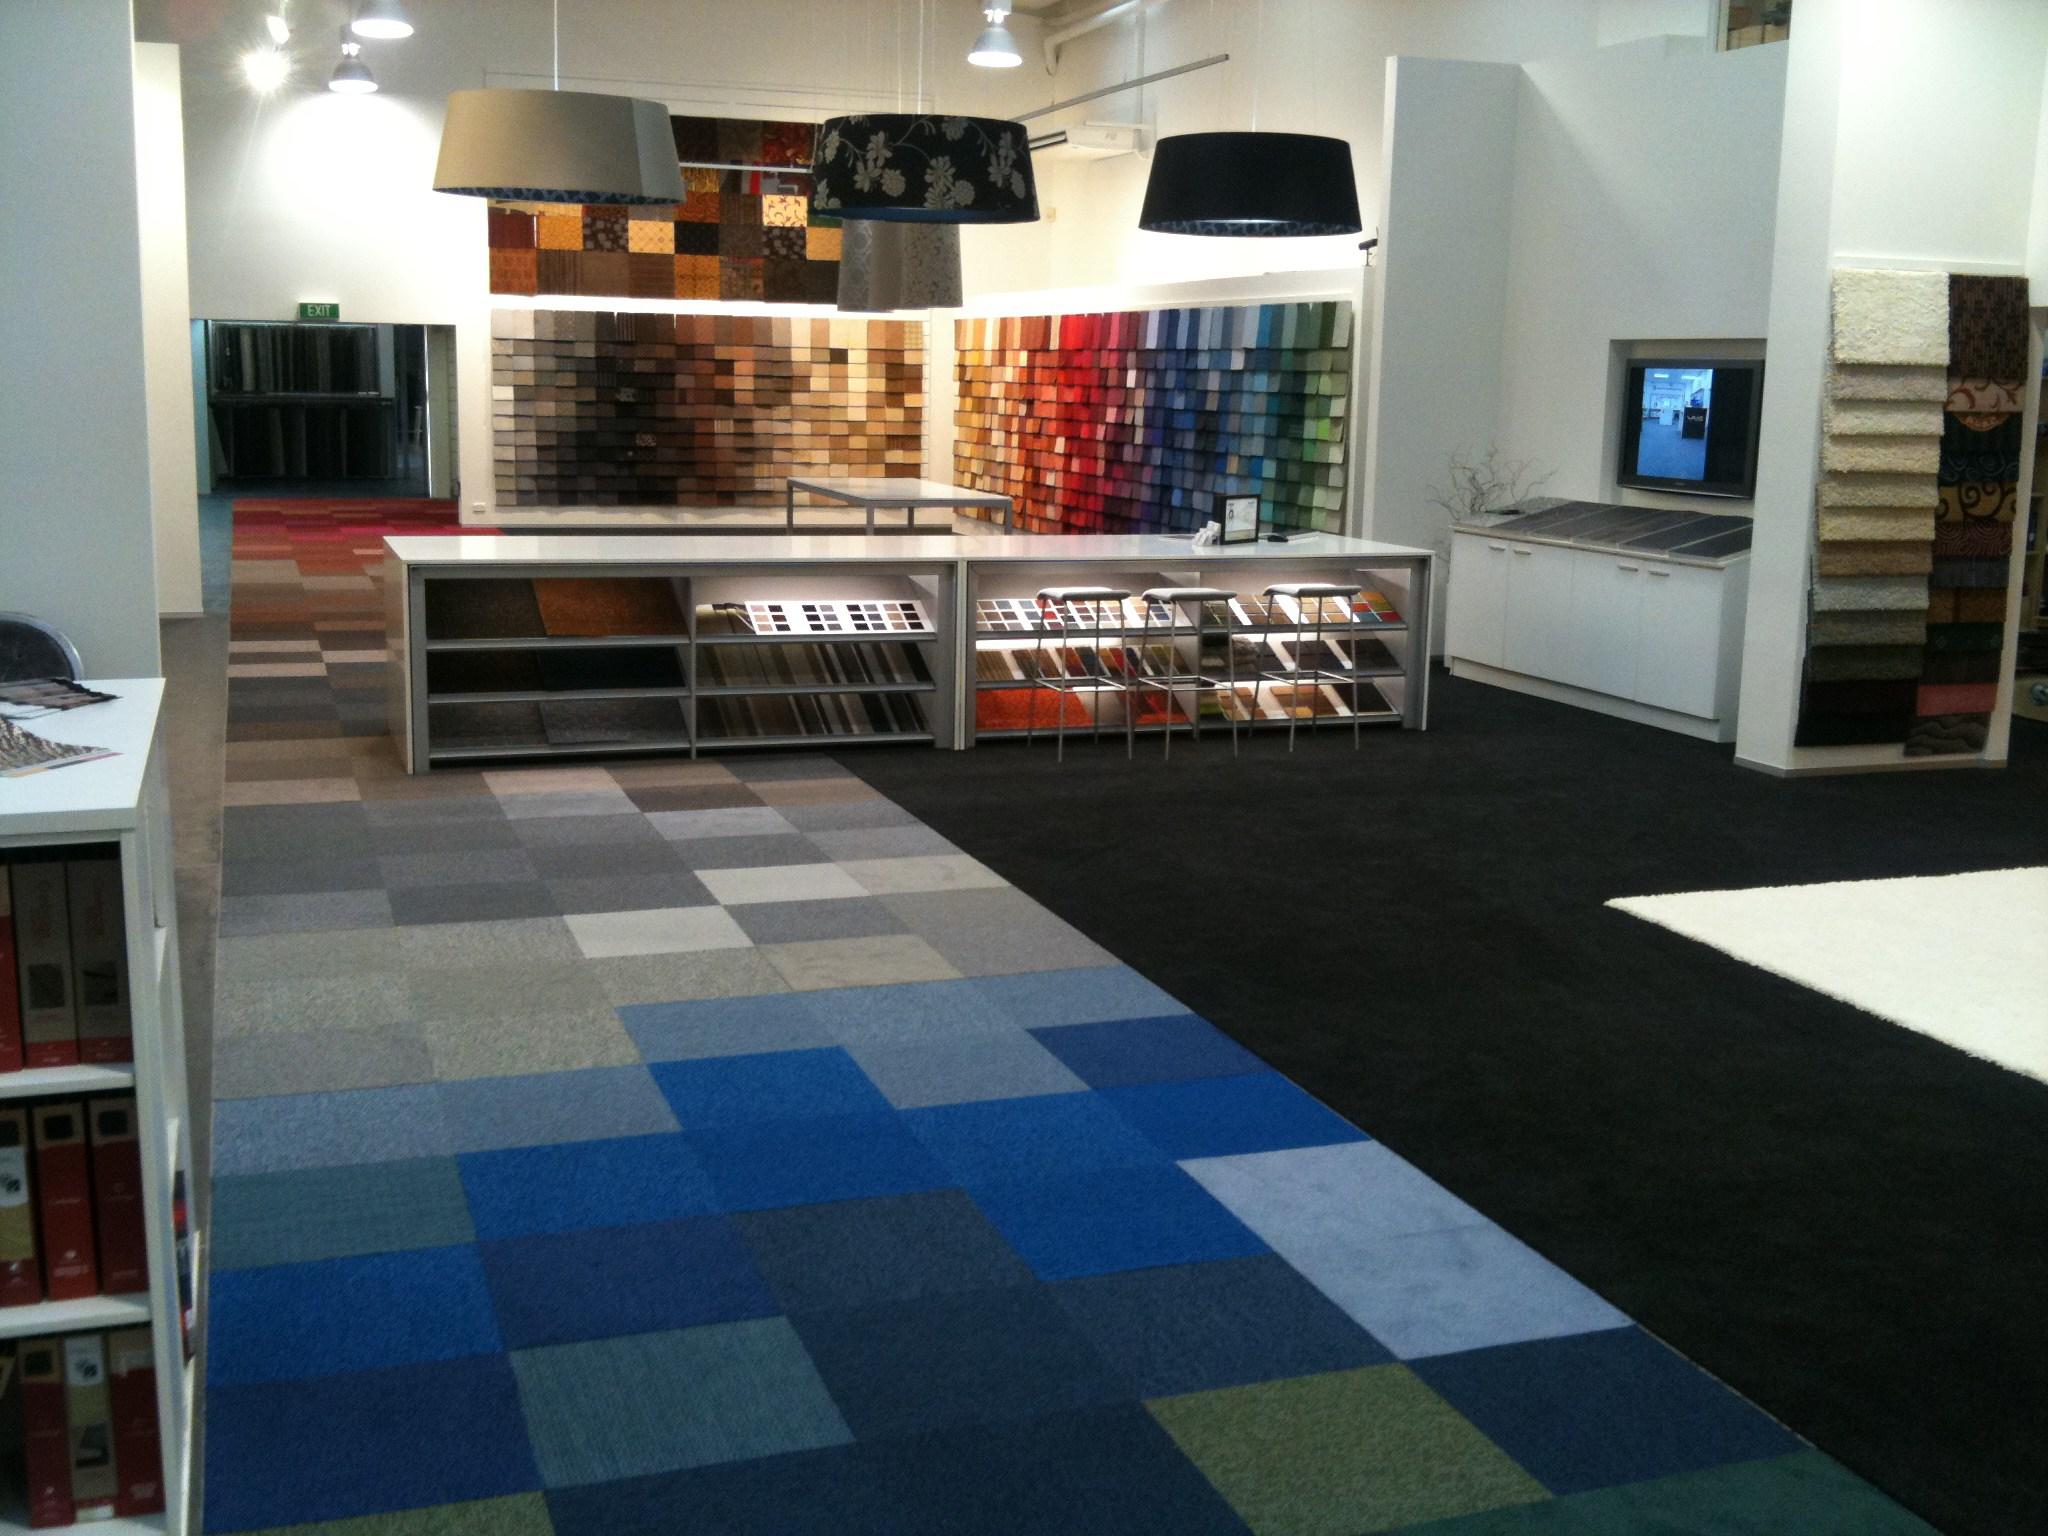 carpet flooring design 100 amazing floor design ideas for homes indoor and outdoor XETCSRX